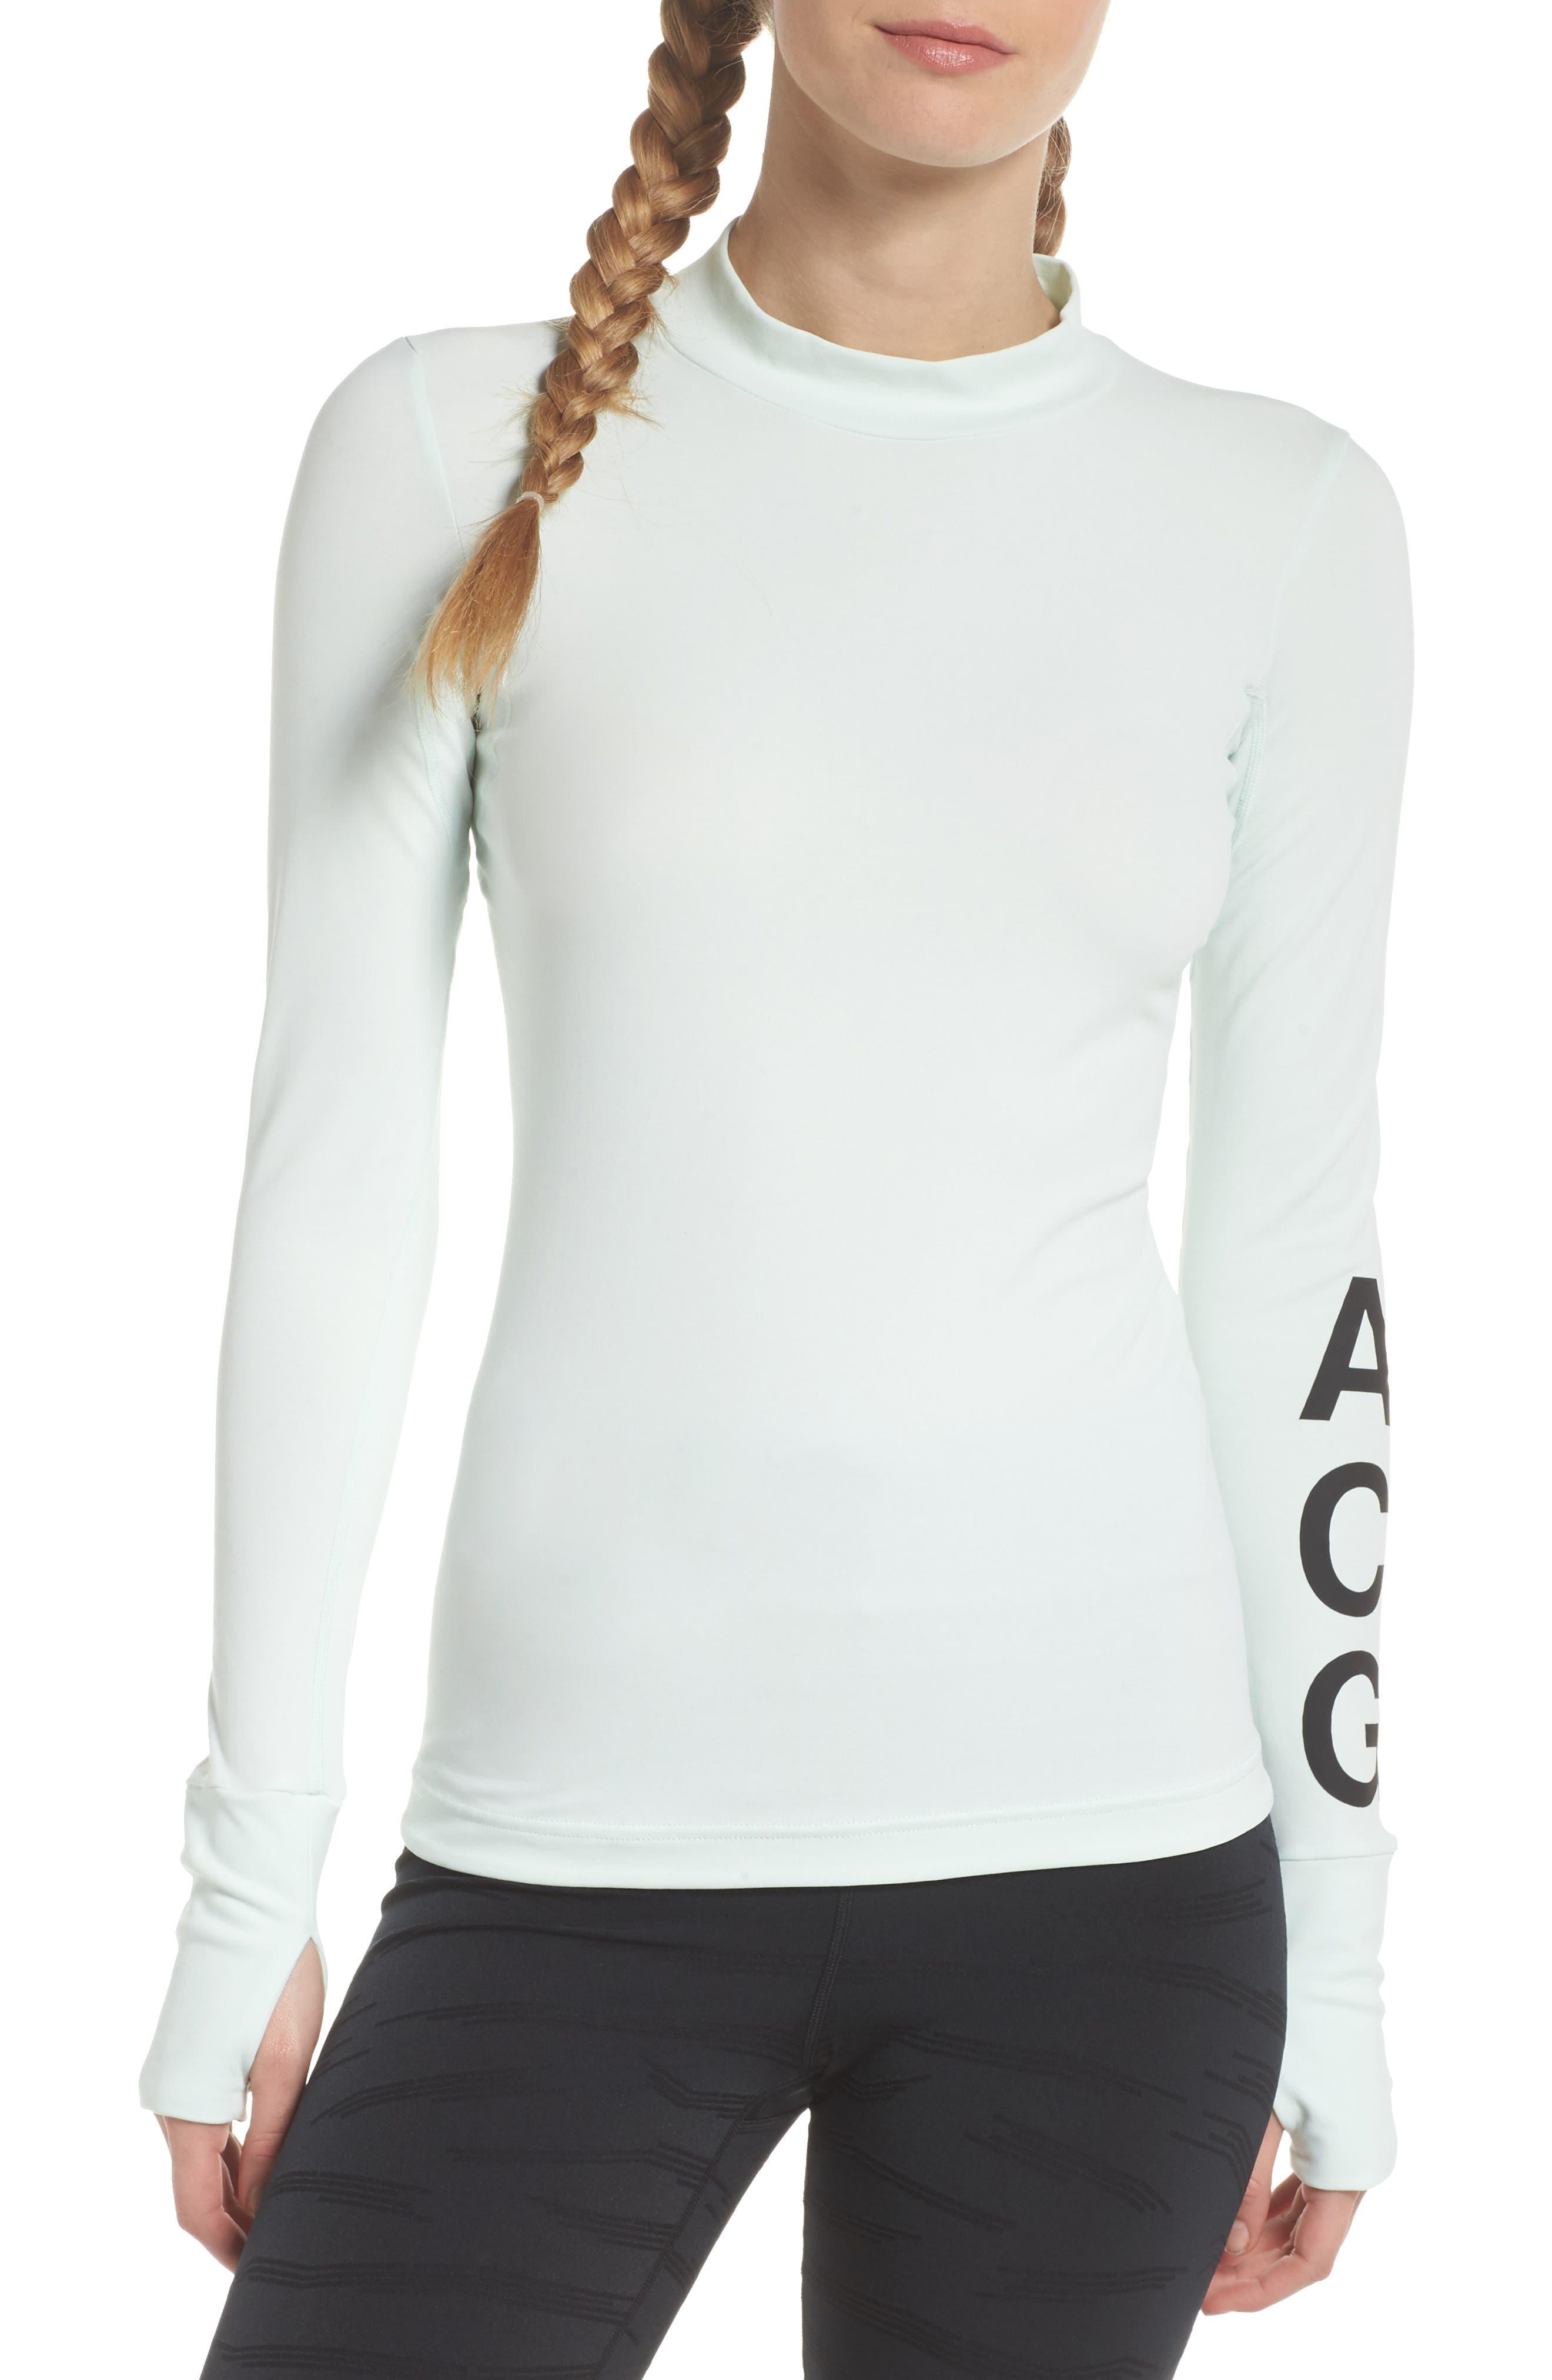 NikeLab ACG Long Sleeve Women's Top,                             Main thumbnail 1, color,                             Barely Green/ Black